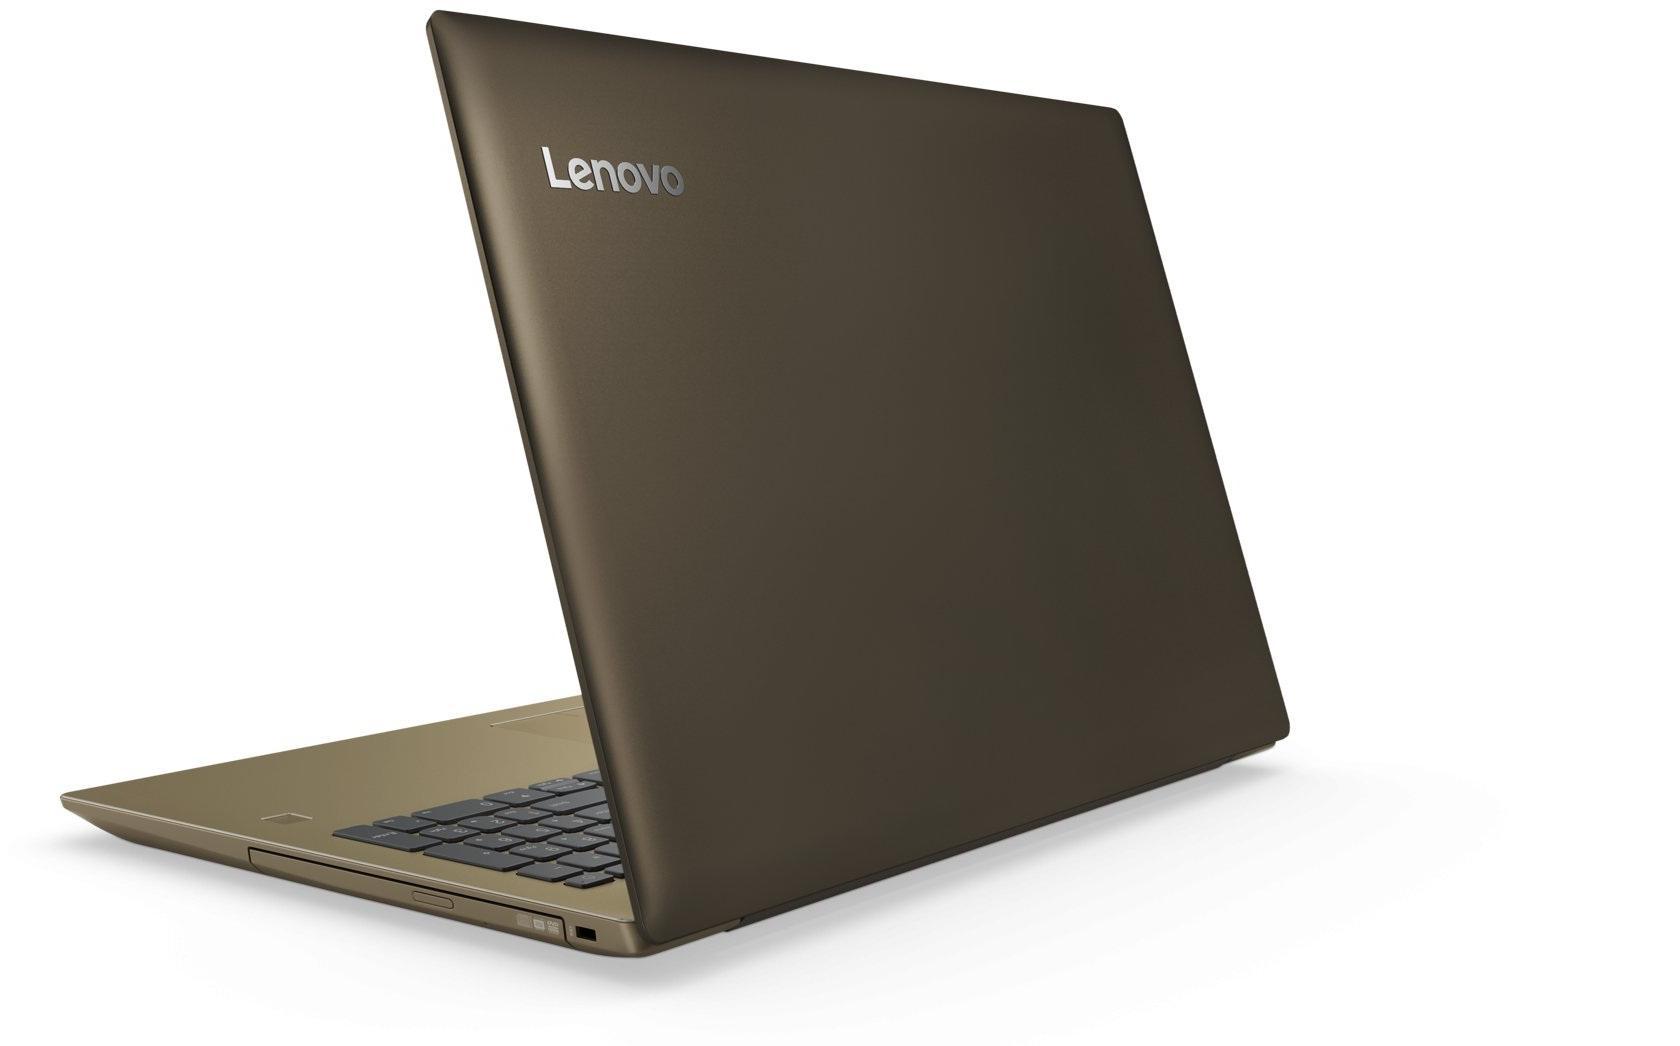 Купить Ноутбук Lenovo IdeaPad 520S-14IKBR (81BL0094RU) фото 3